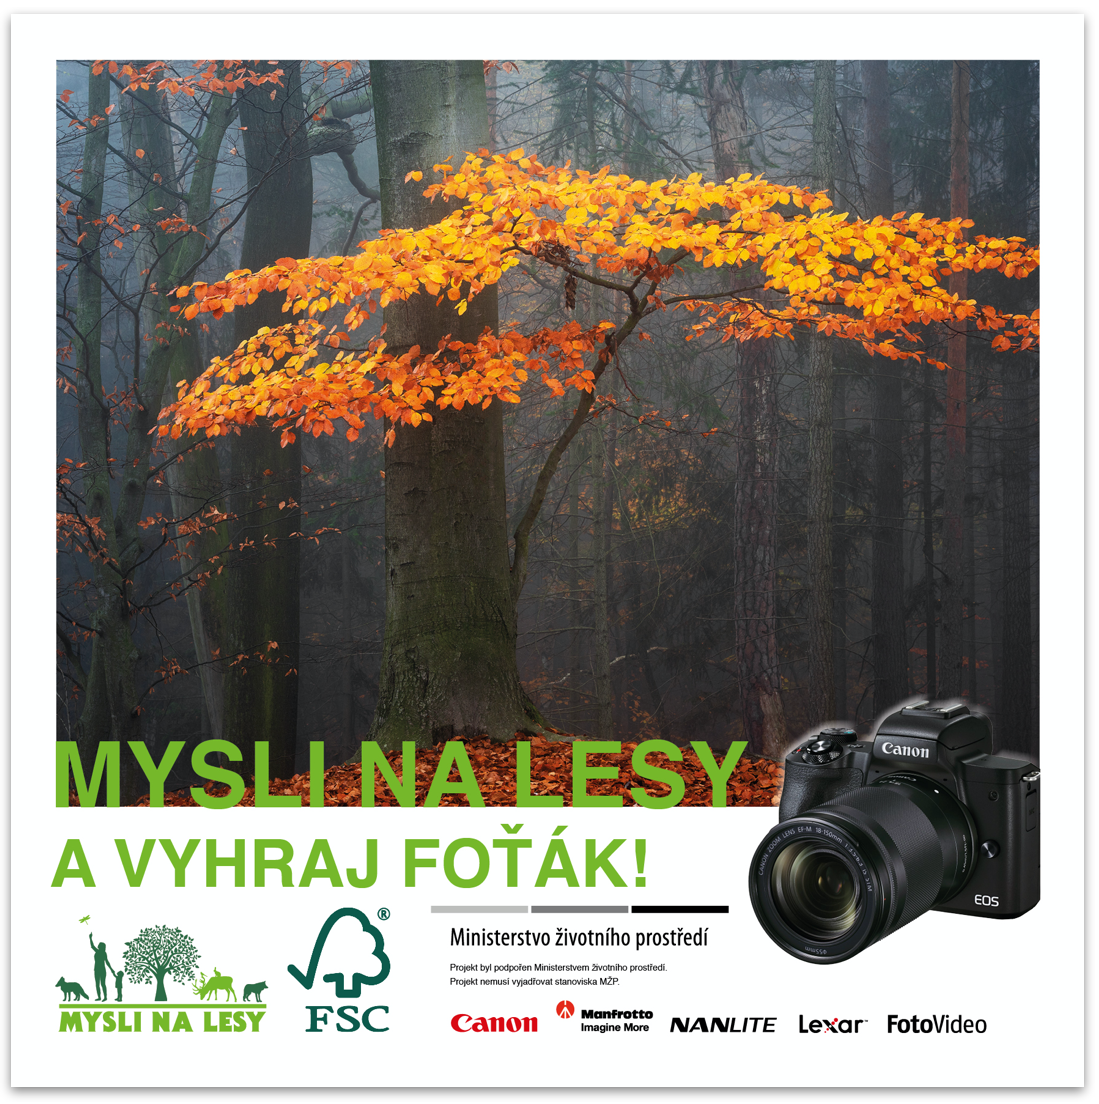 a flyer for the Mysli na lesy photo competition